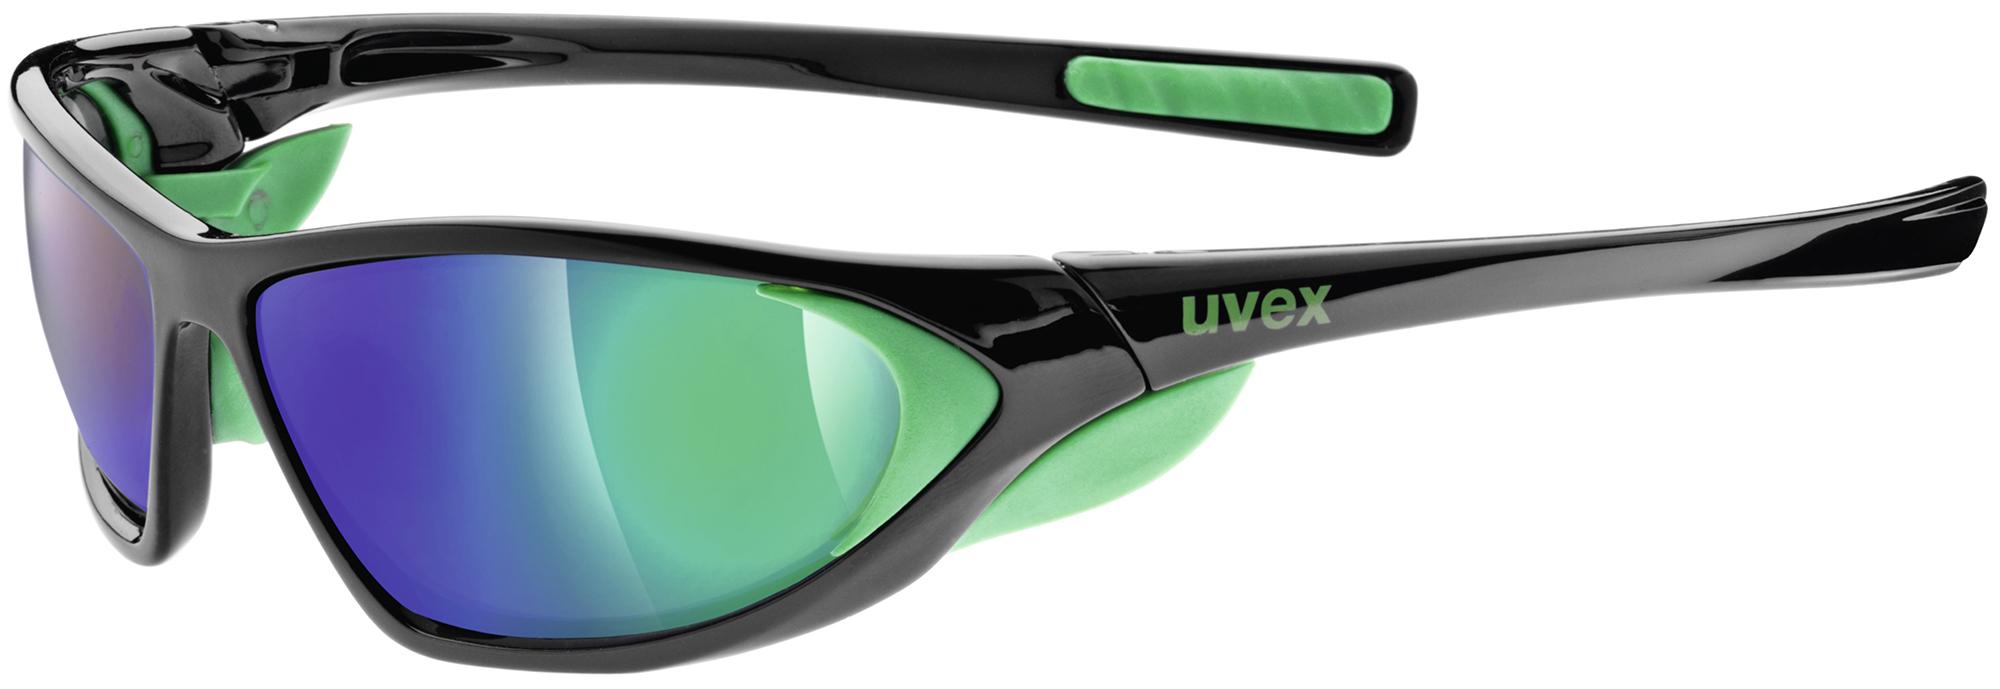 Uvex Солнцезащитные очки Uvex очки от солнца мужские